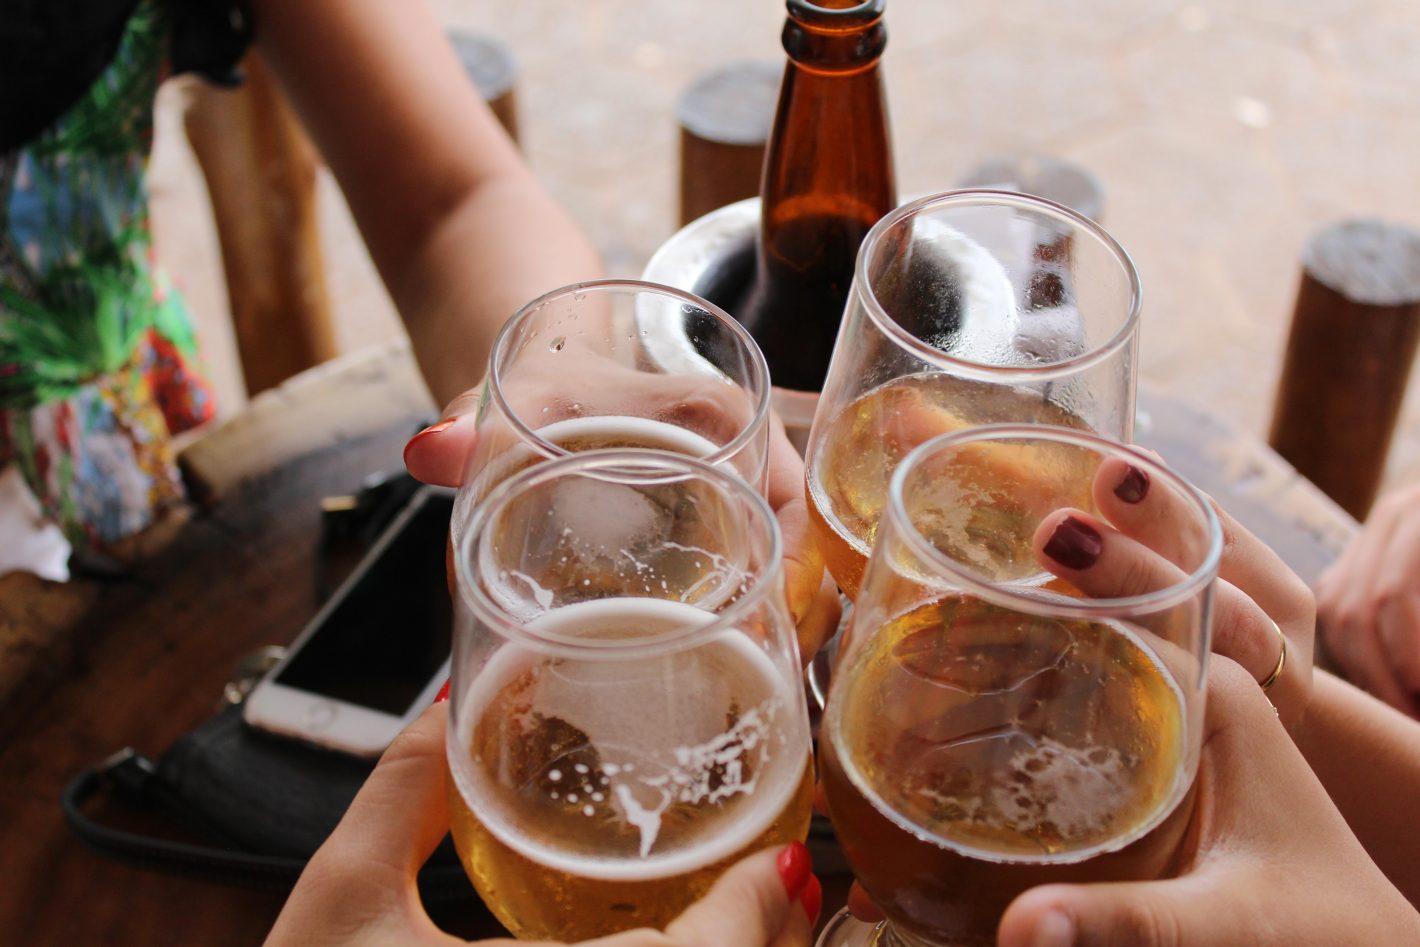 Øl-connoisseur? Bryg din egen øl